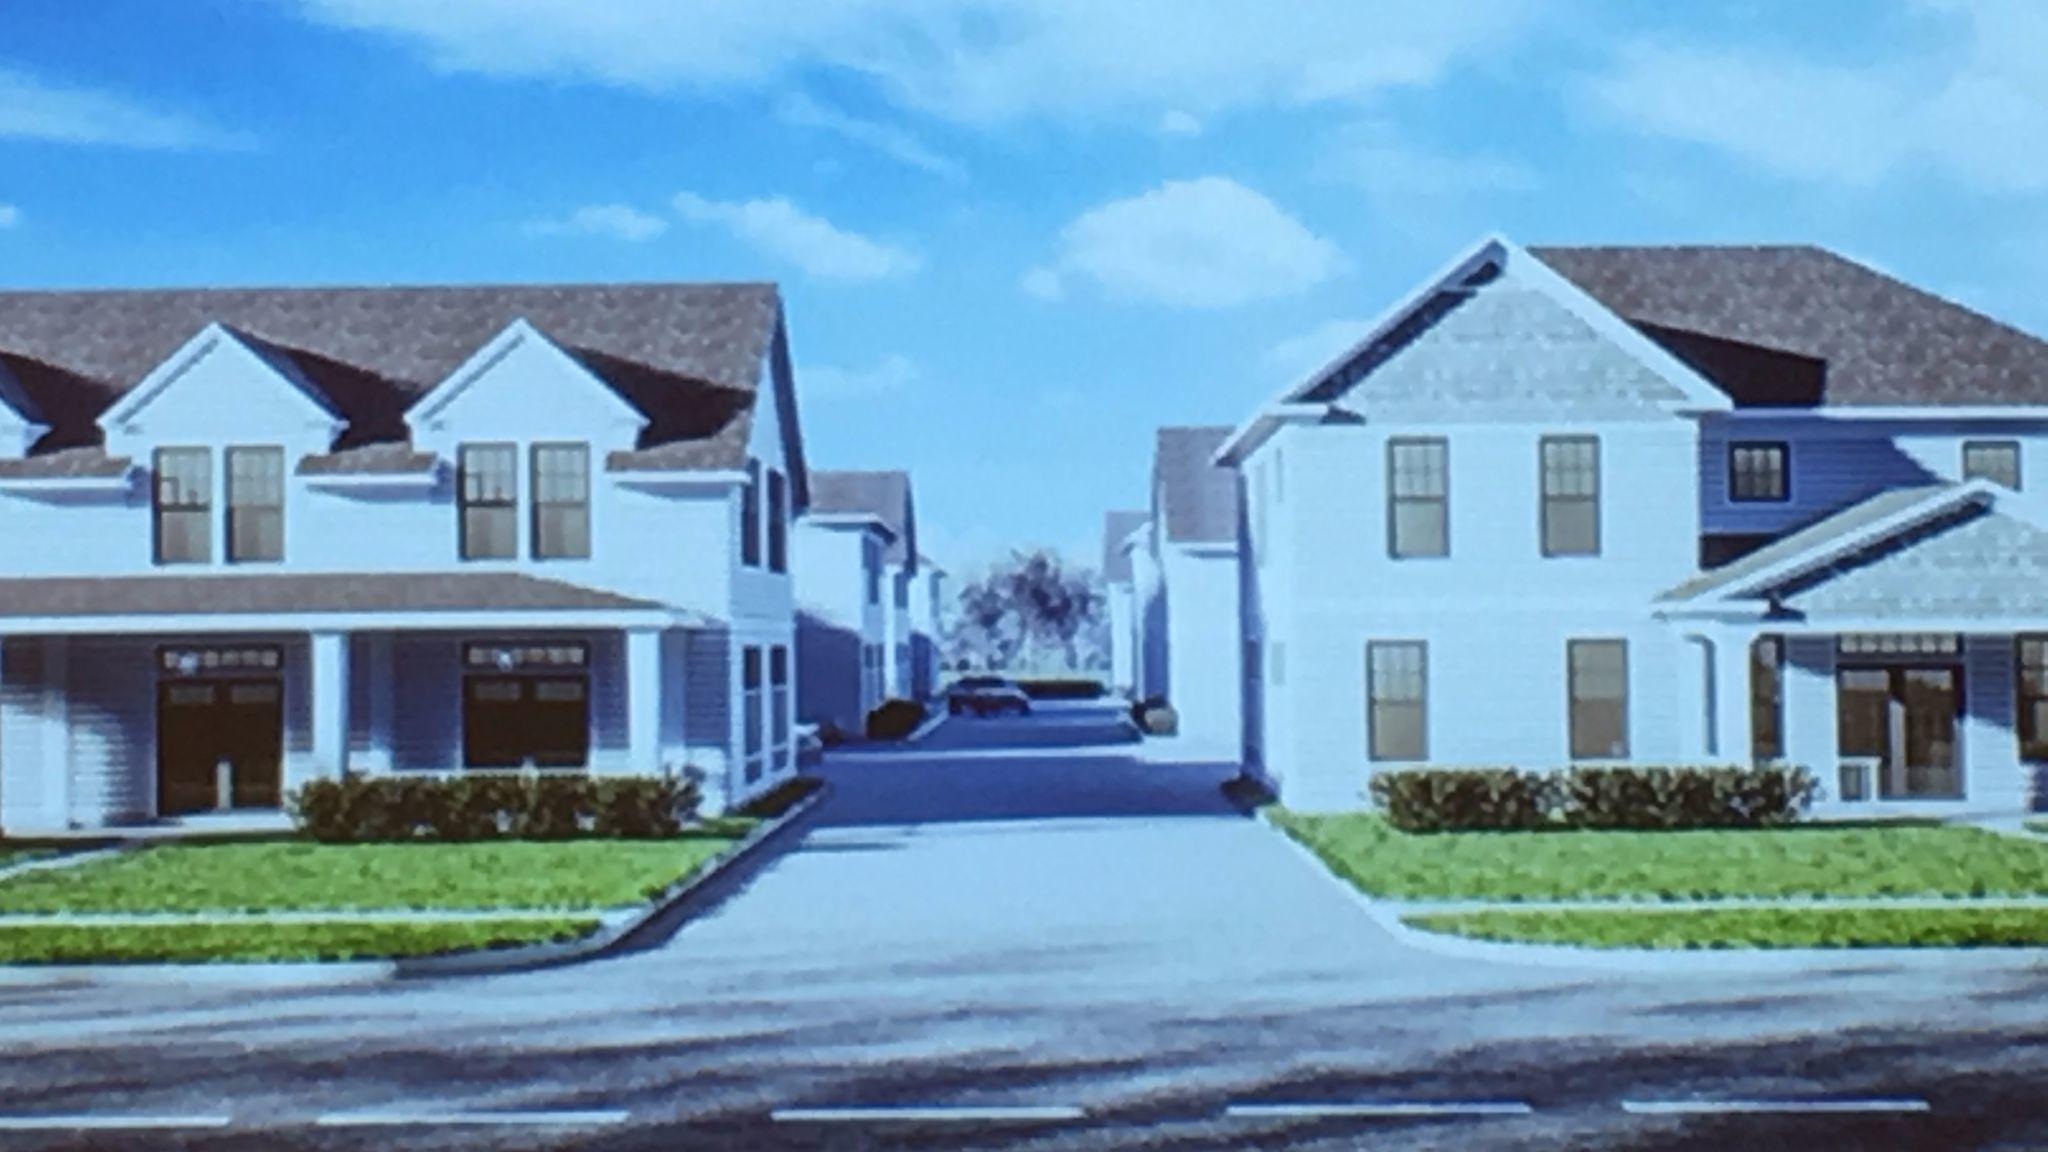 Proposed Elm Street development in Deerfield reduced to 8 homes